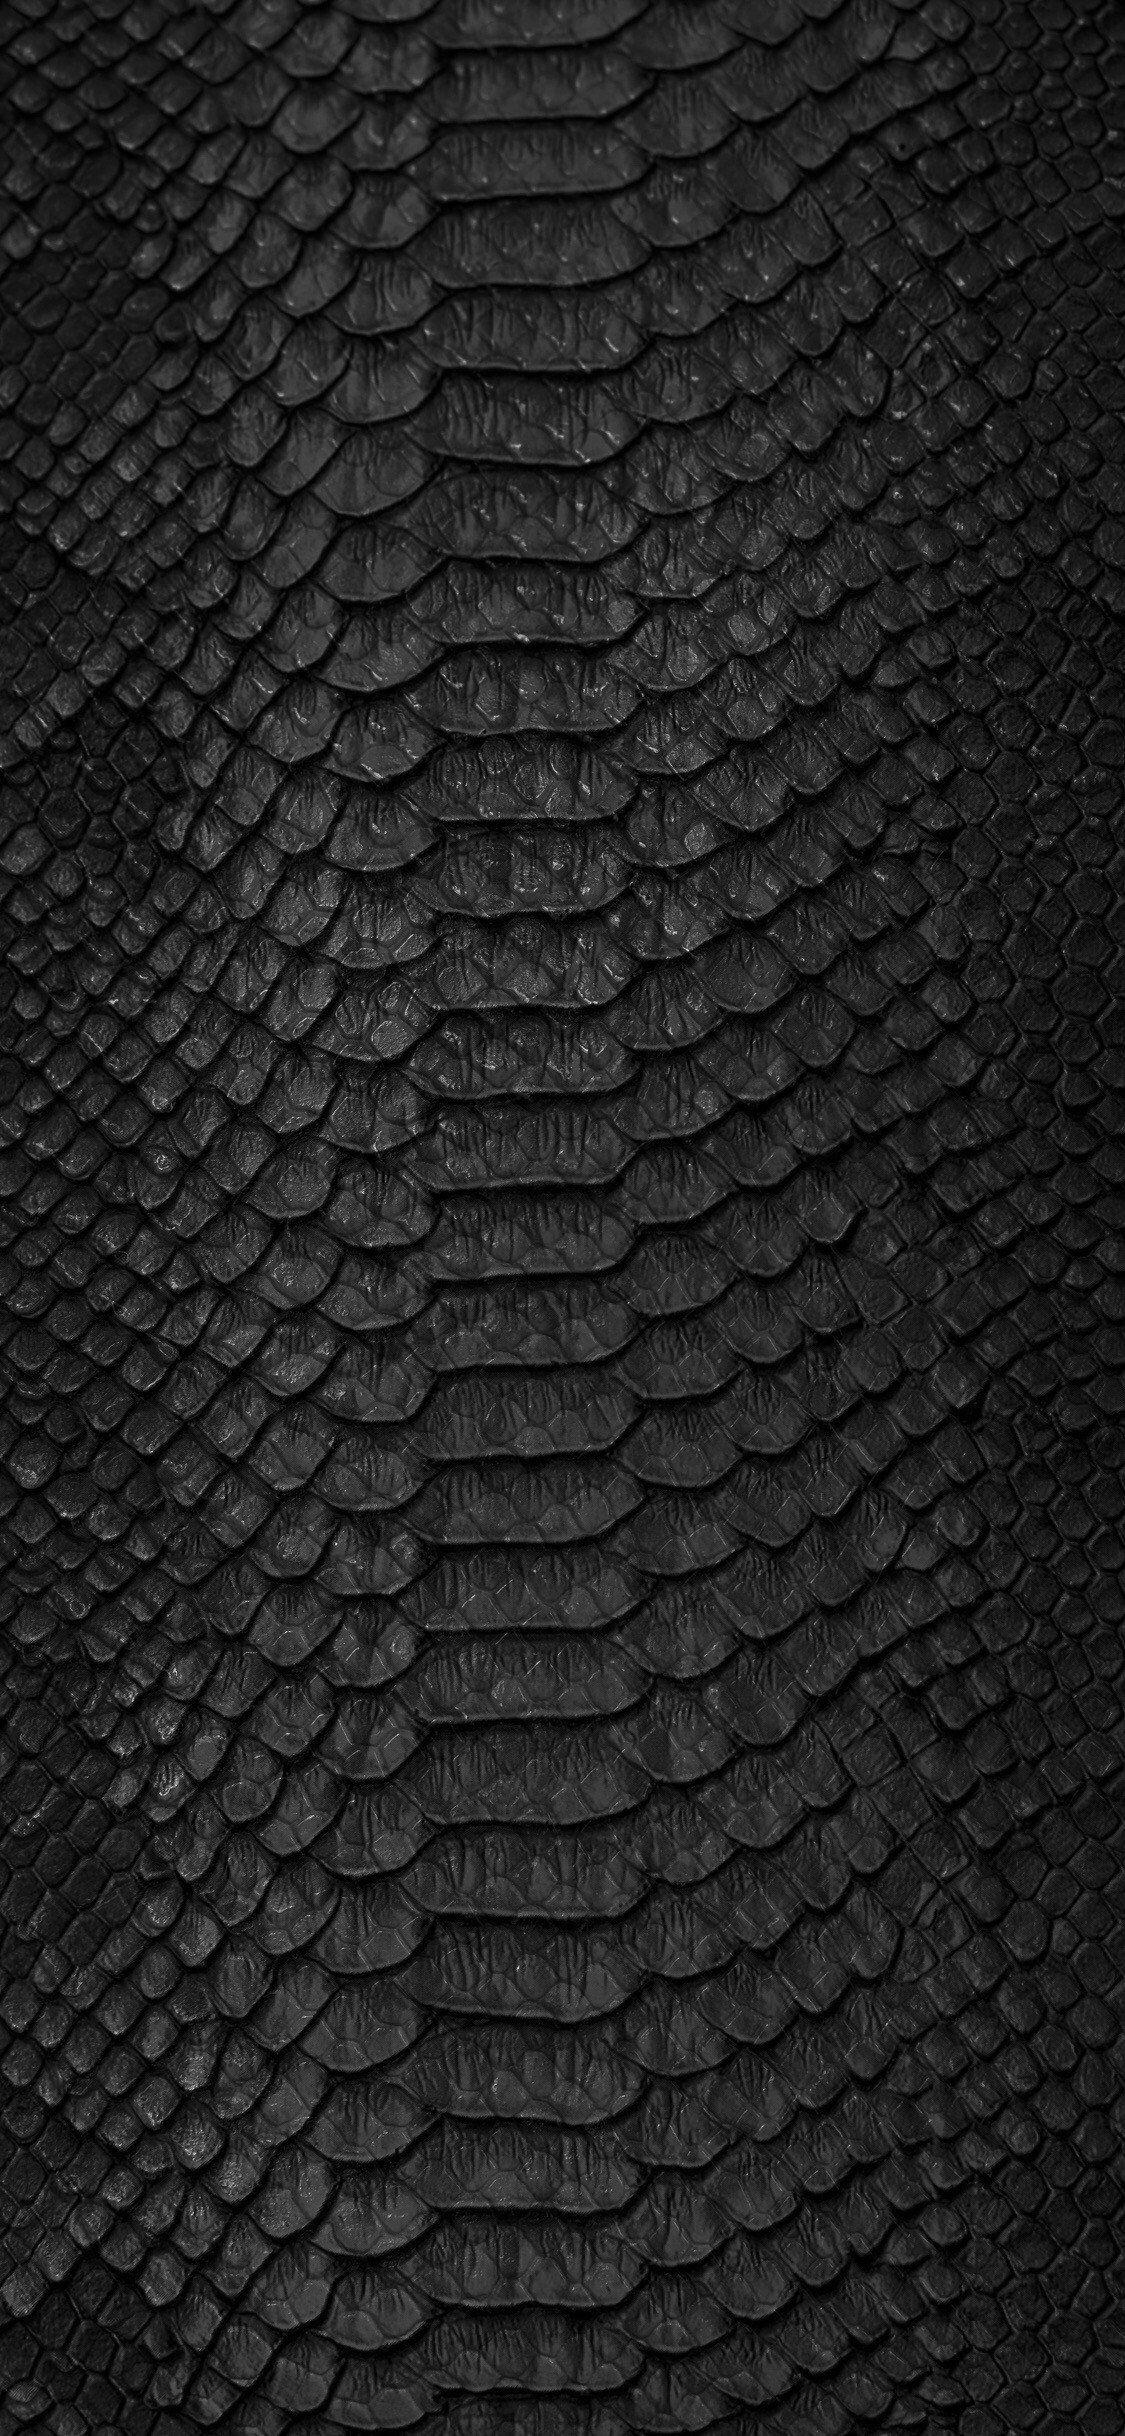 Black iPhone X Wallpapers iPhoneXWallpaper Iphone